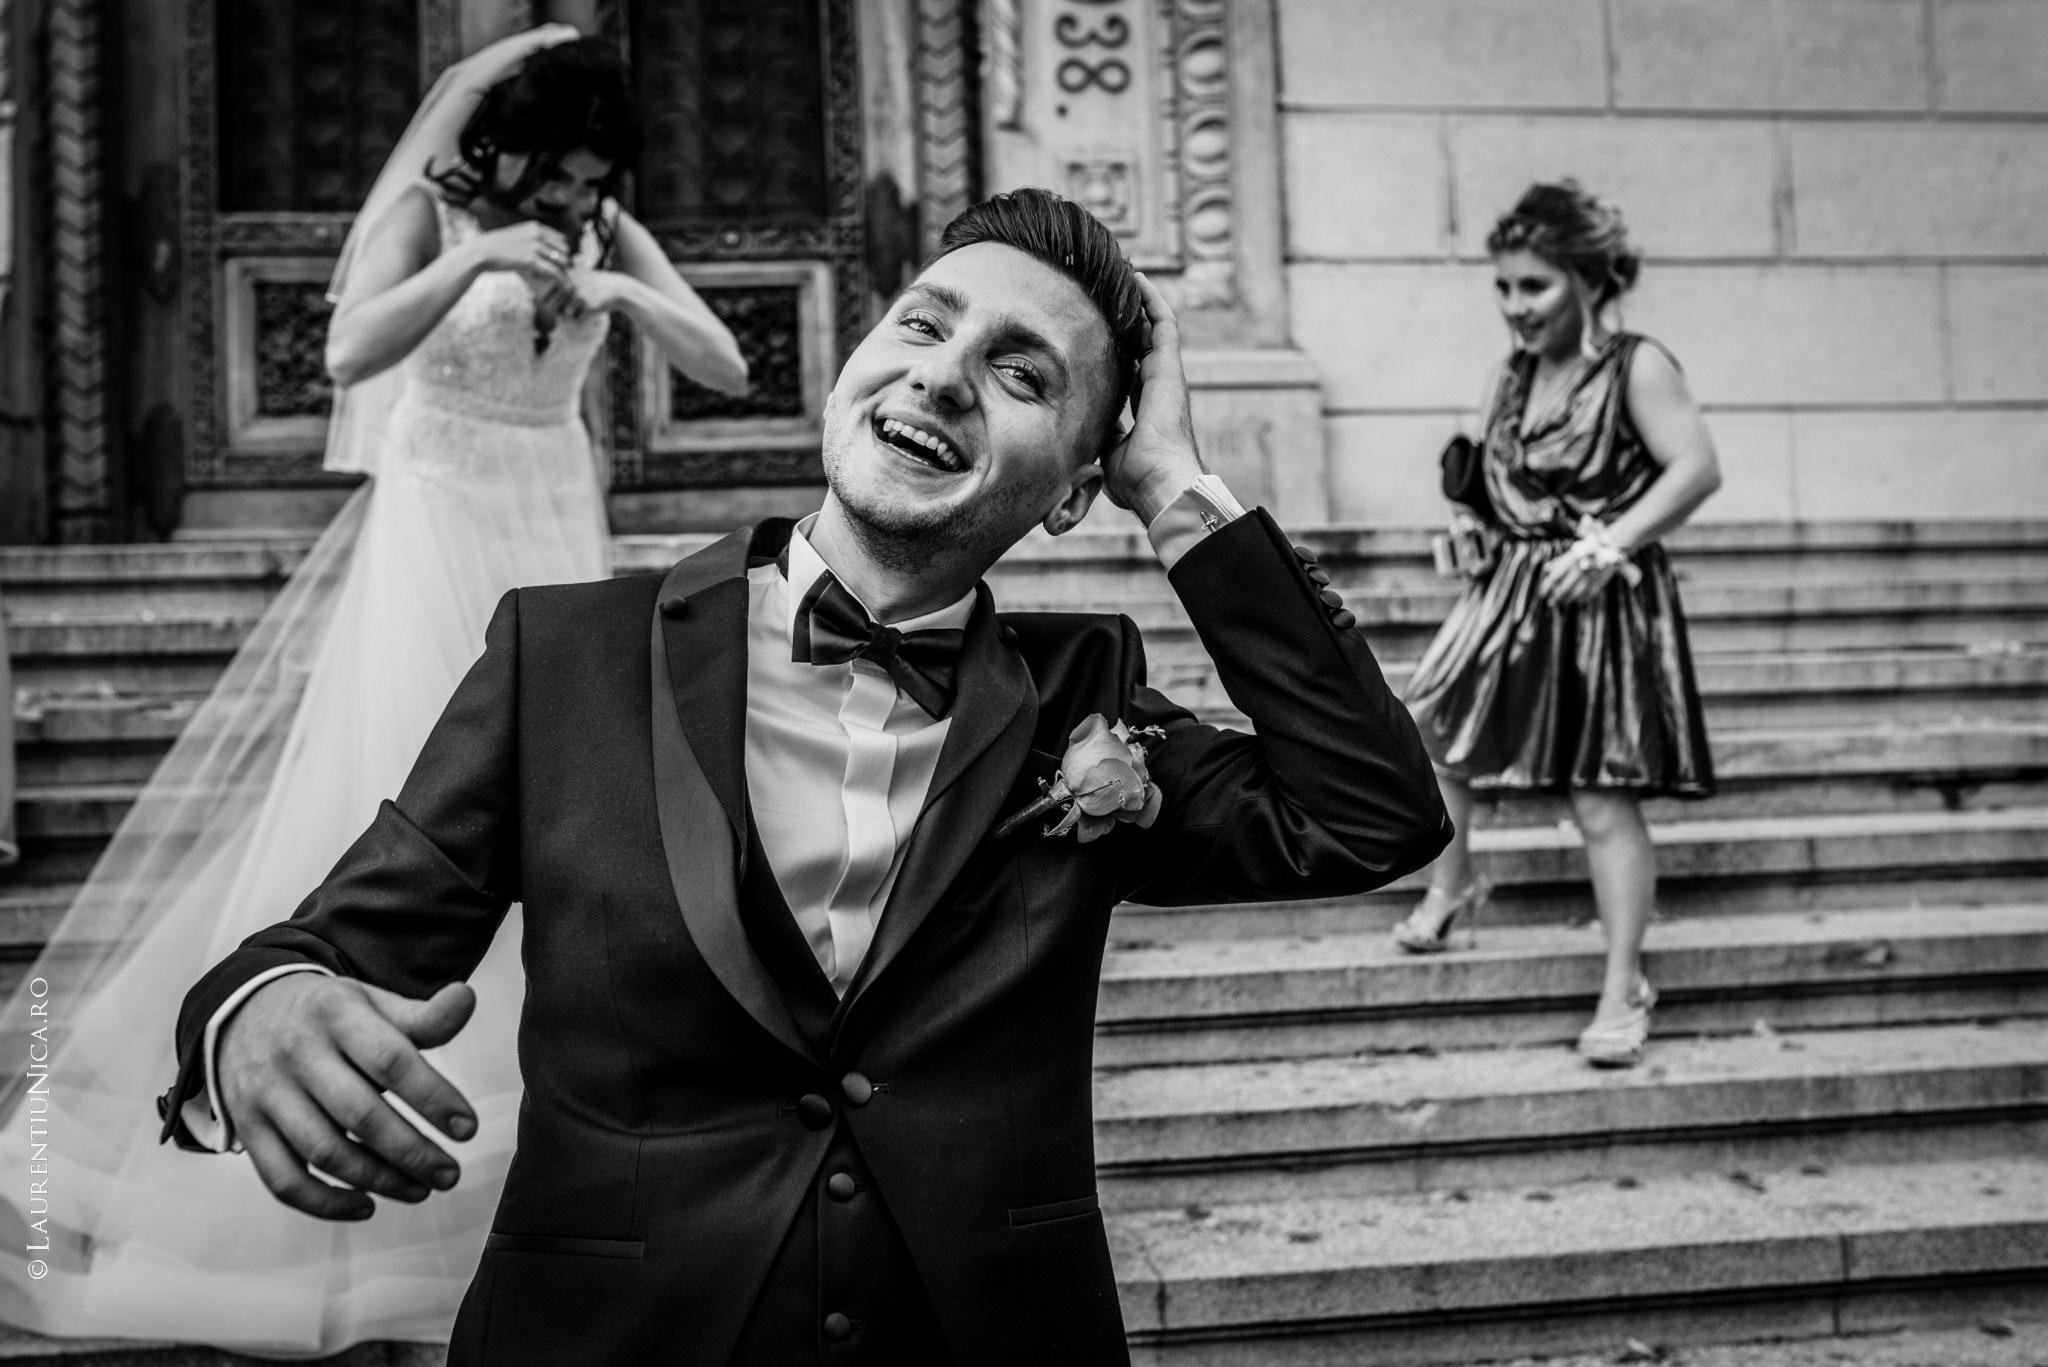 fotografii nunta craiova bia alex fotograf nunta laurentiu nica 41 - Bia & Alex | Fotografii nunta | Craiova